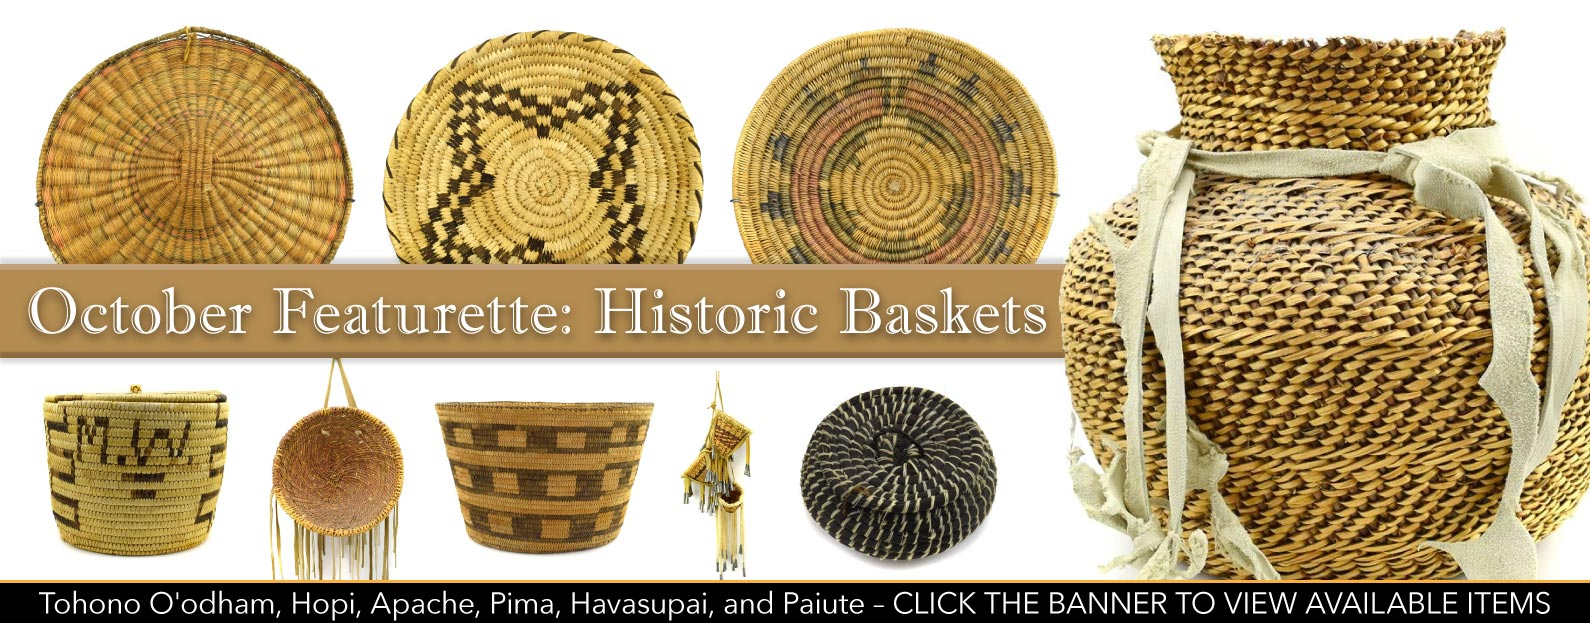 October Featurette: Historic Baskets from the Tohono O'odham, Hopi, Apache, Pima, Havasupai, and Paiute